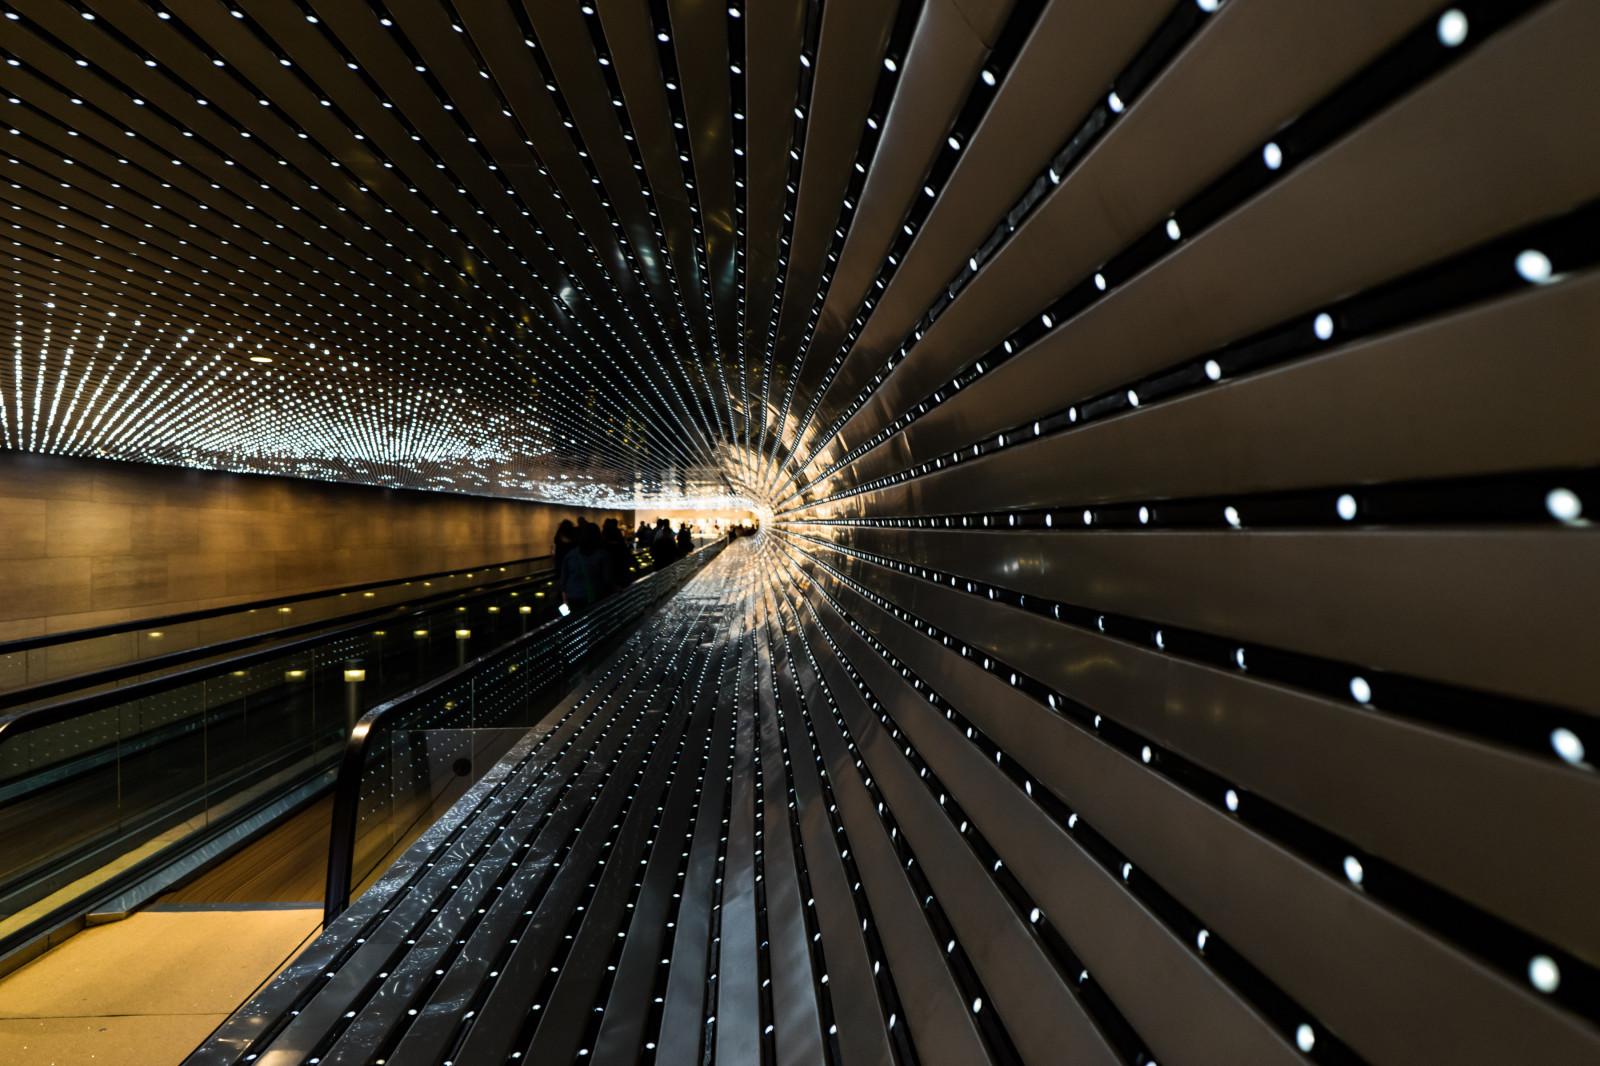 Fondos de pantalla  luces noche arquitectura interior